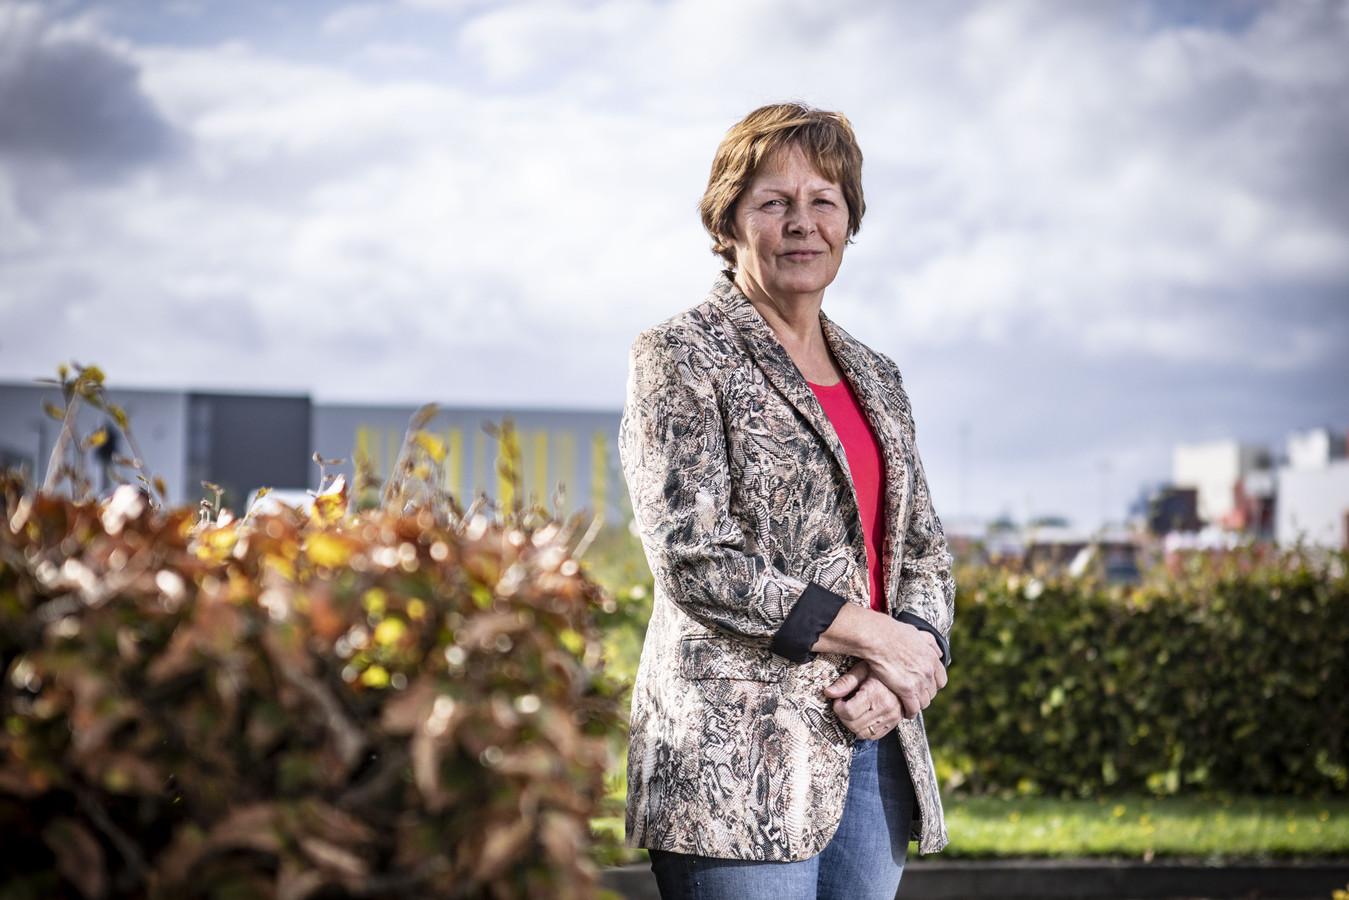 Cöordinator Gerda Kievitsbosch